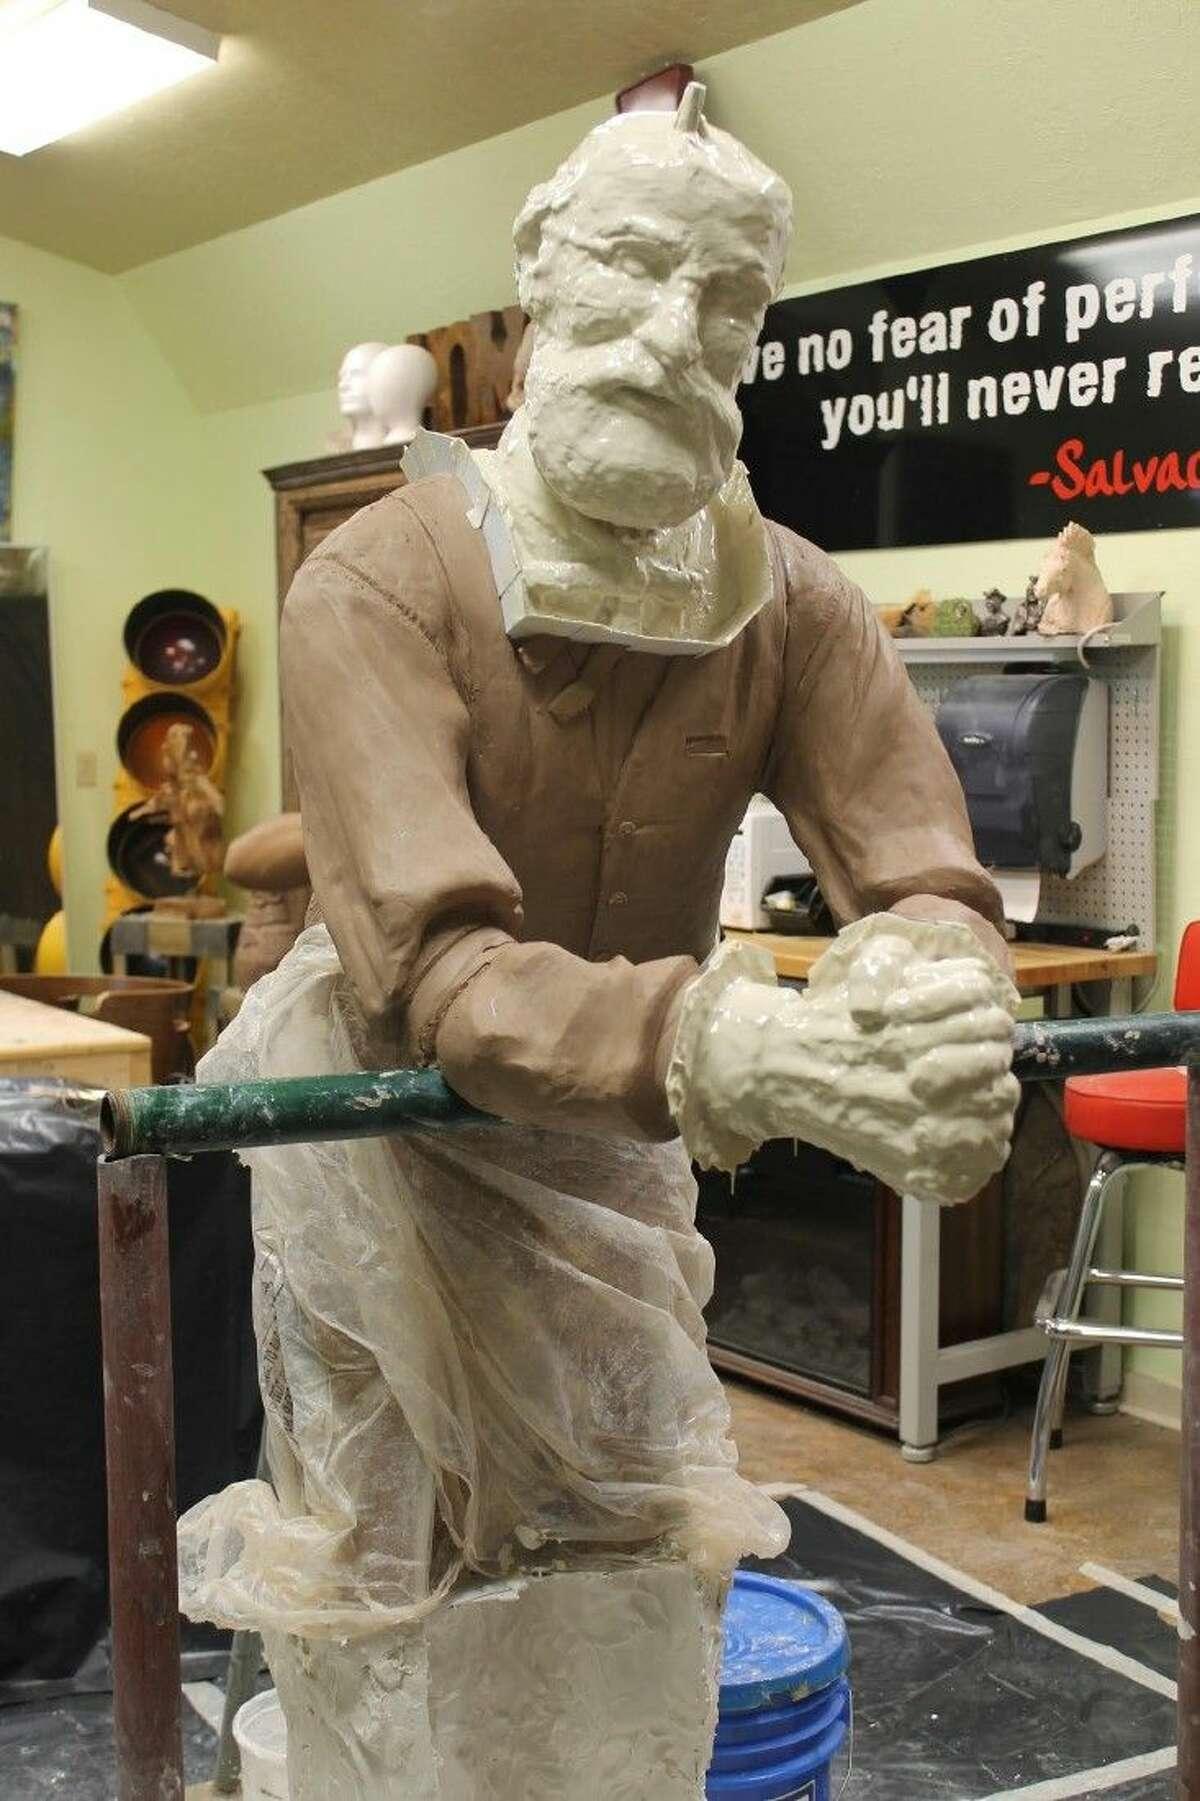 The Ken Walden sculpture is a work in progress.